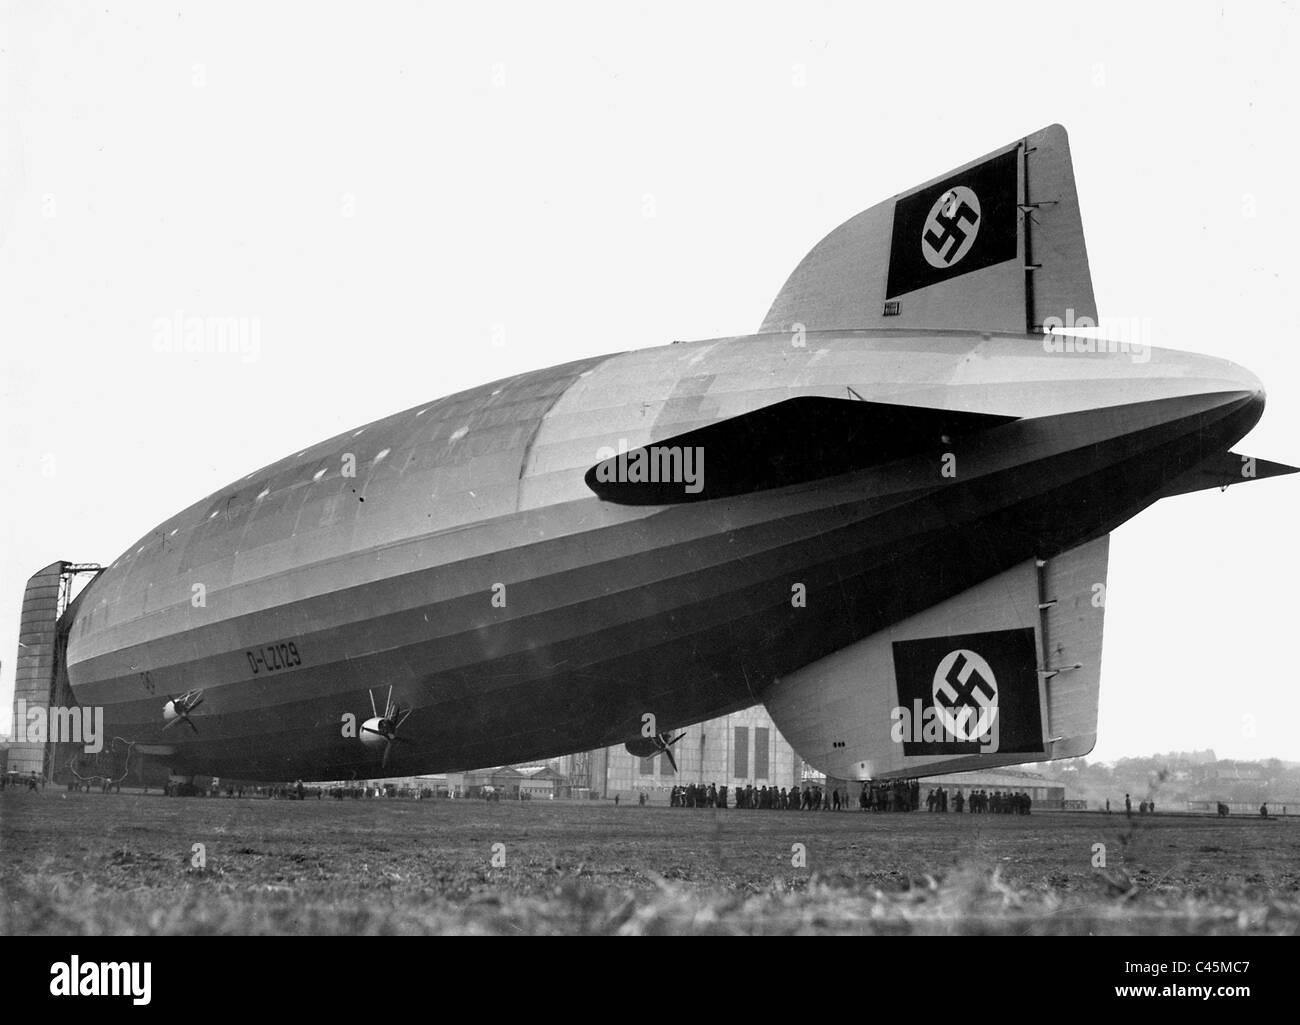 der erstflug des zeppelin luftschiff hindenburg lz 129. Black Bedroom Furniture Sets. Home Design Ideas